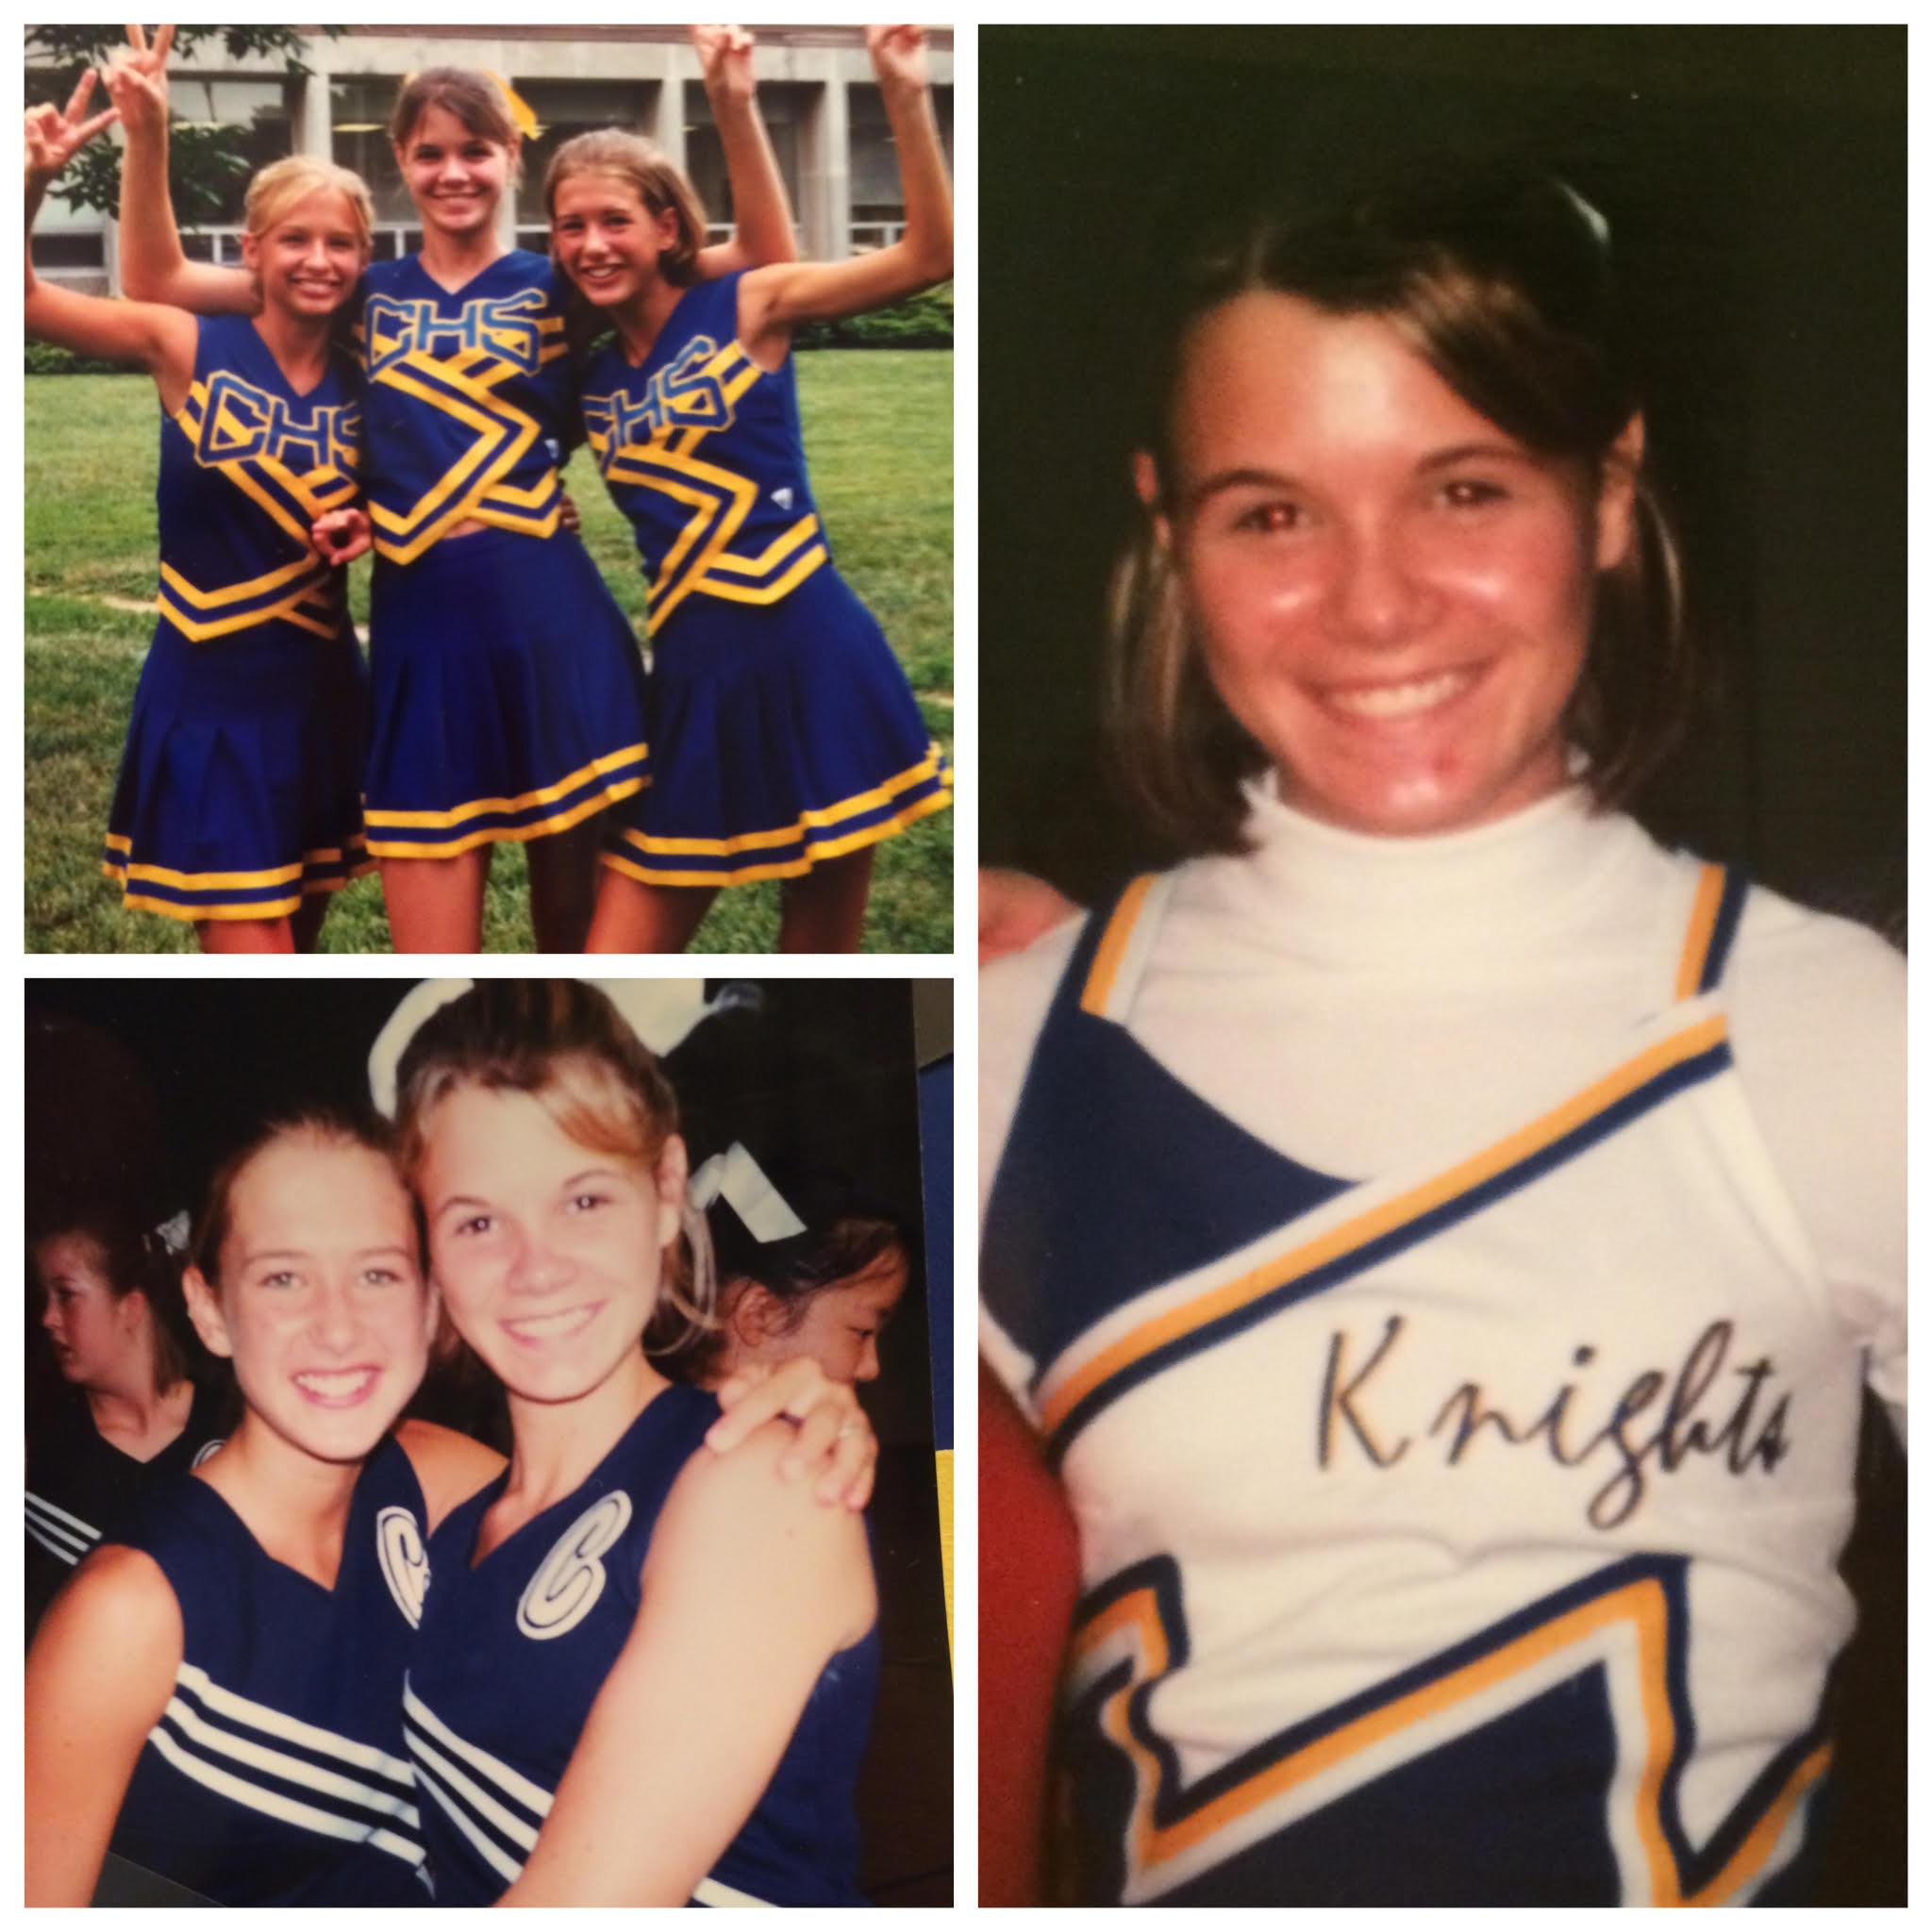 A few flashback photos to my cheer days!